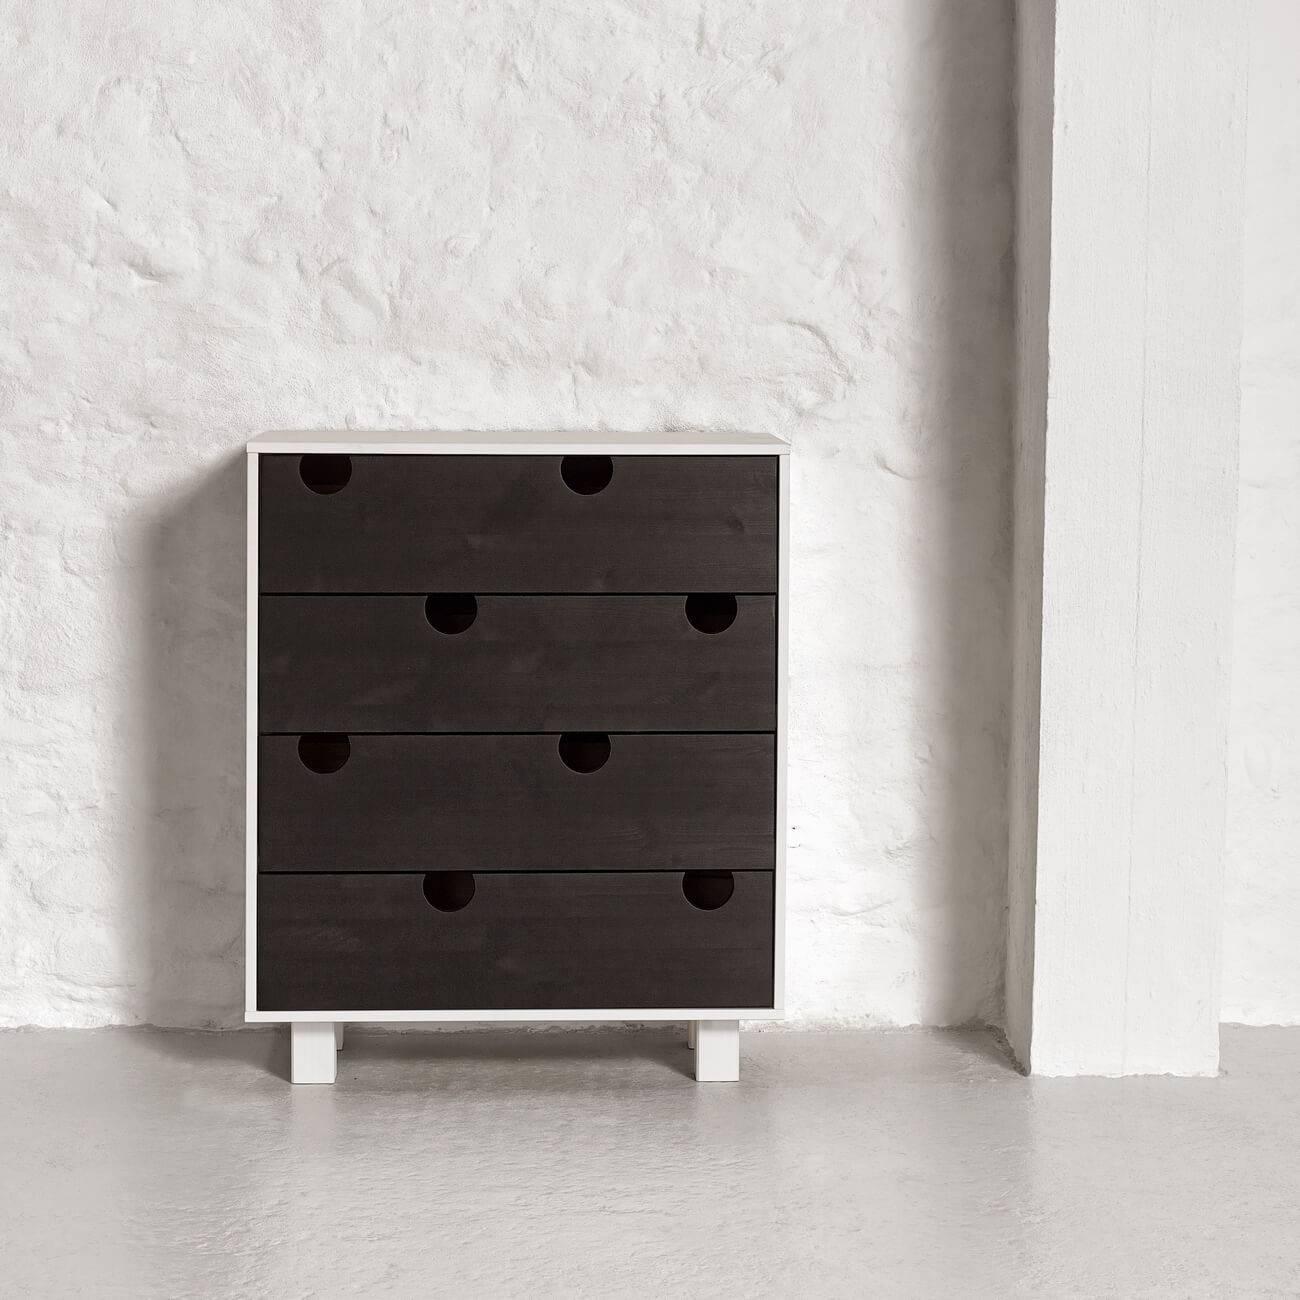 Karup ladekast House 4 wit / zwart